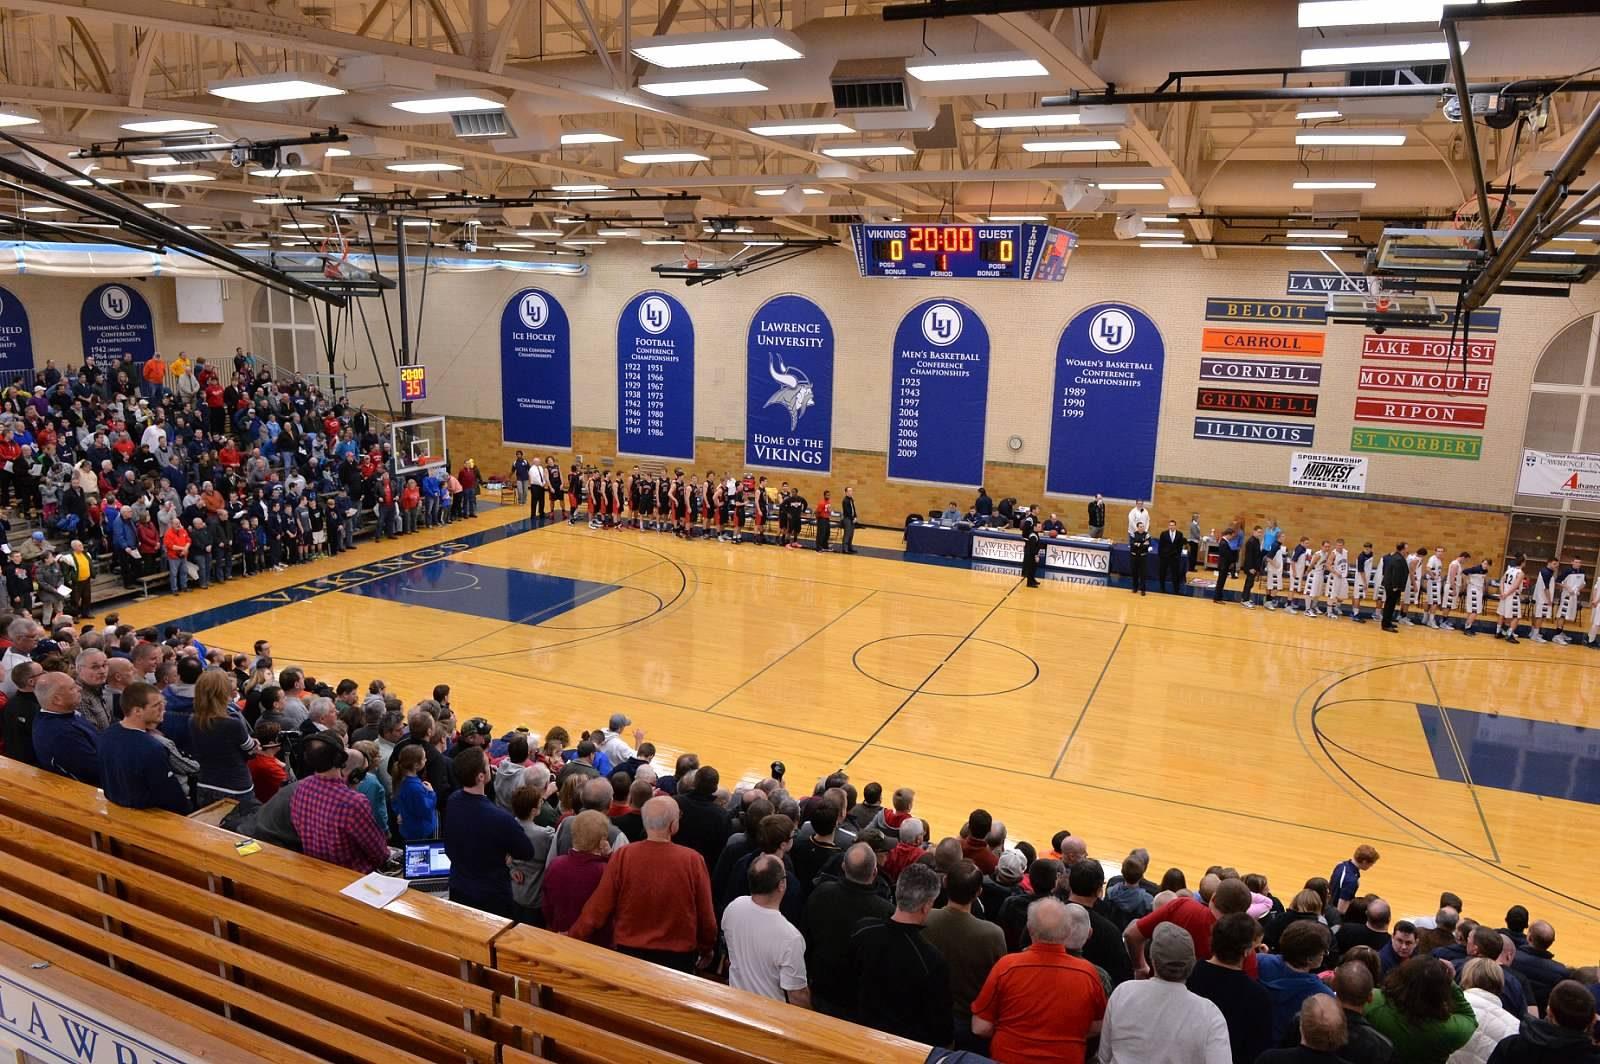 2018 Girls Basketball Camp Registration  Lawrence University